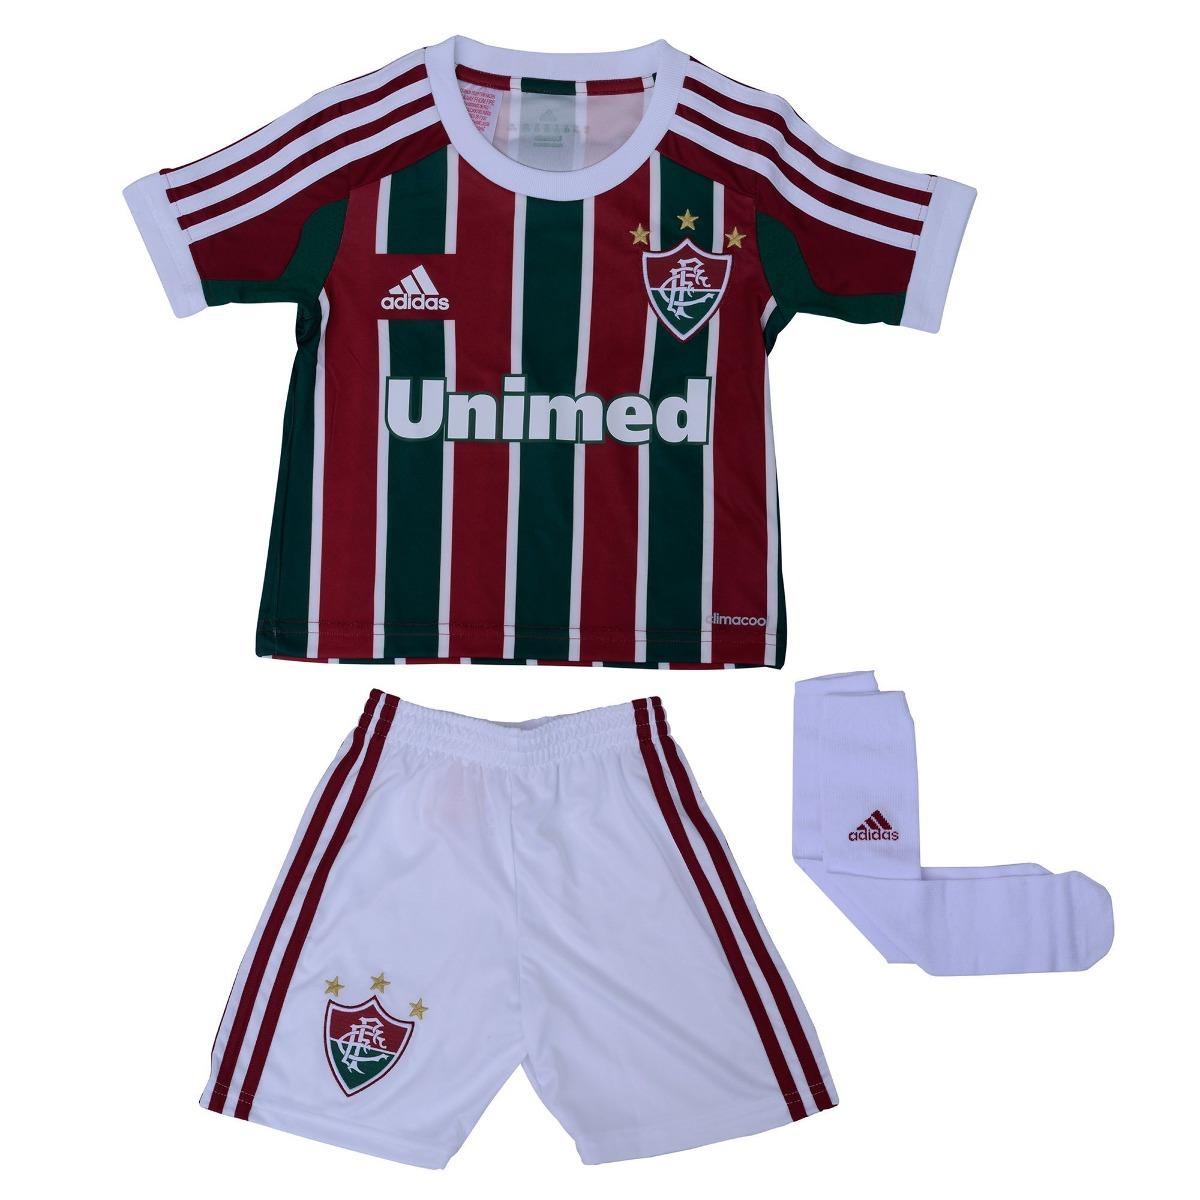 eece4811e1 2anos Mini Kit adidas Fluminense Camisa Shorts Meião 1magnus - R  69 ...